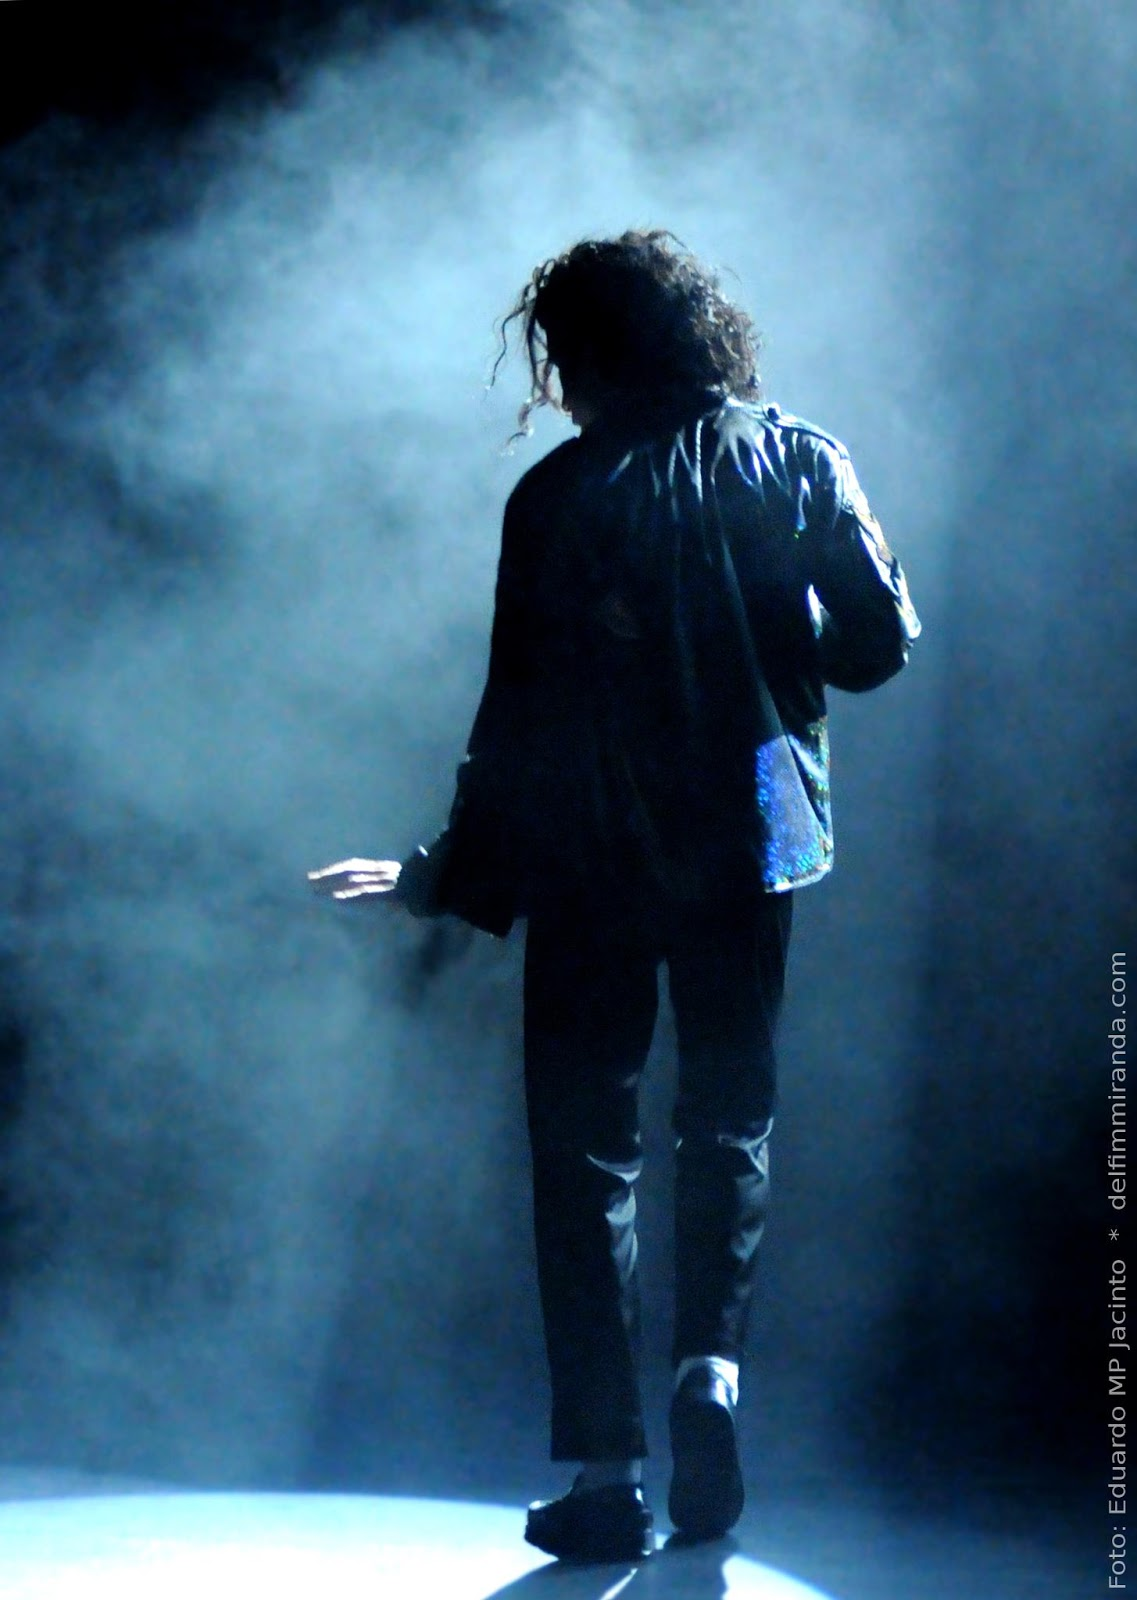 Delfim Miranda - Michael Jackson Tribute - Stage performance